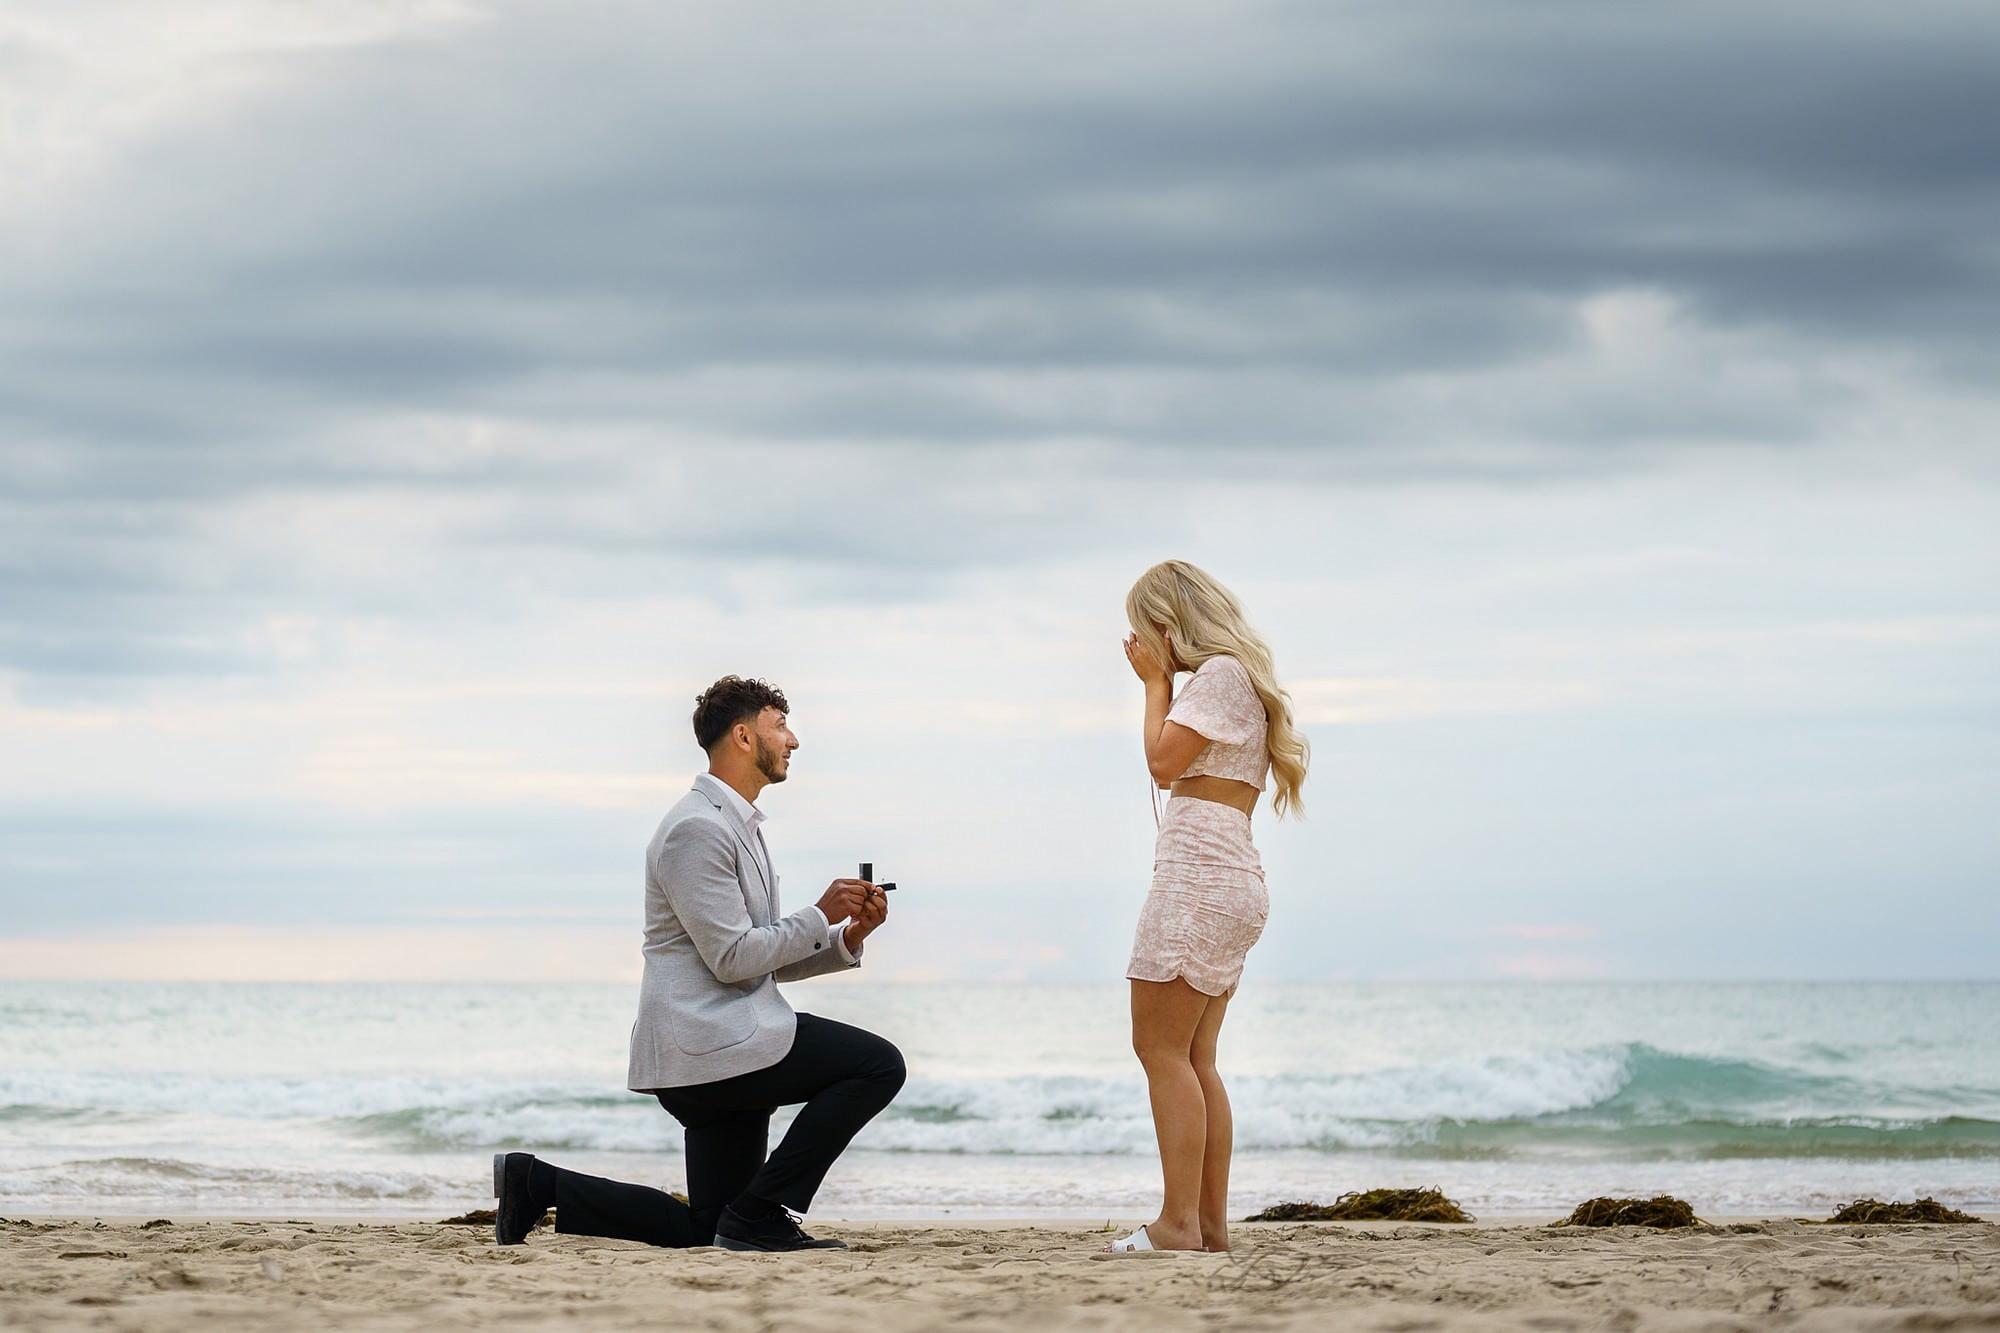 cornish coast wedding proposal 1